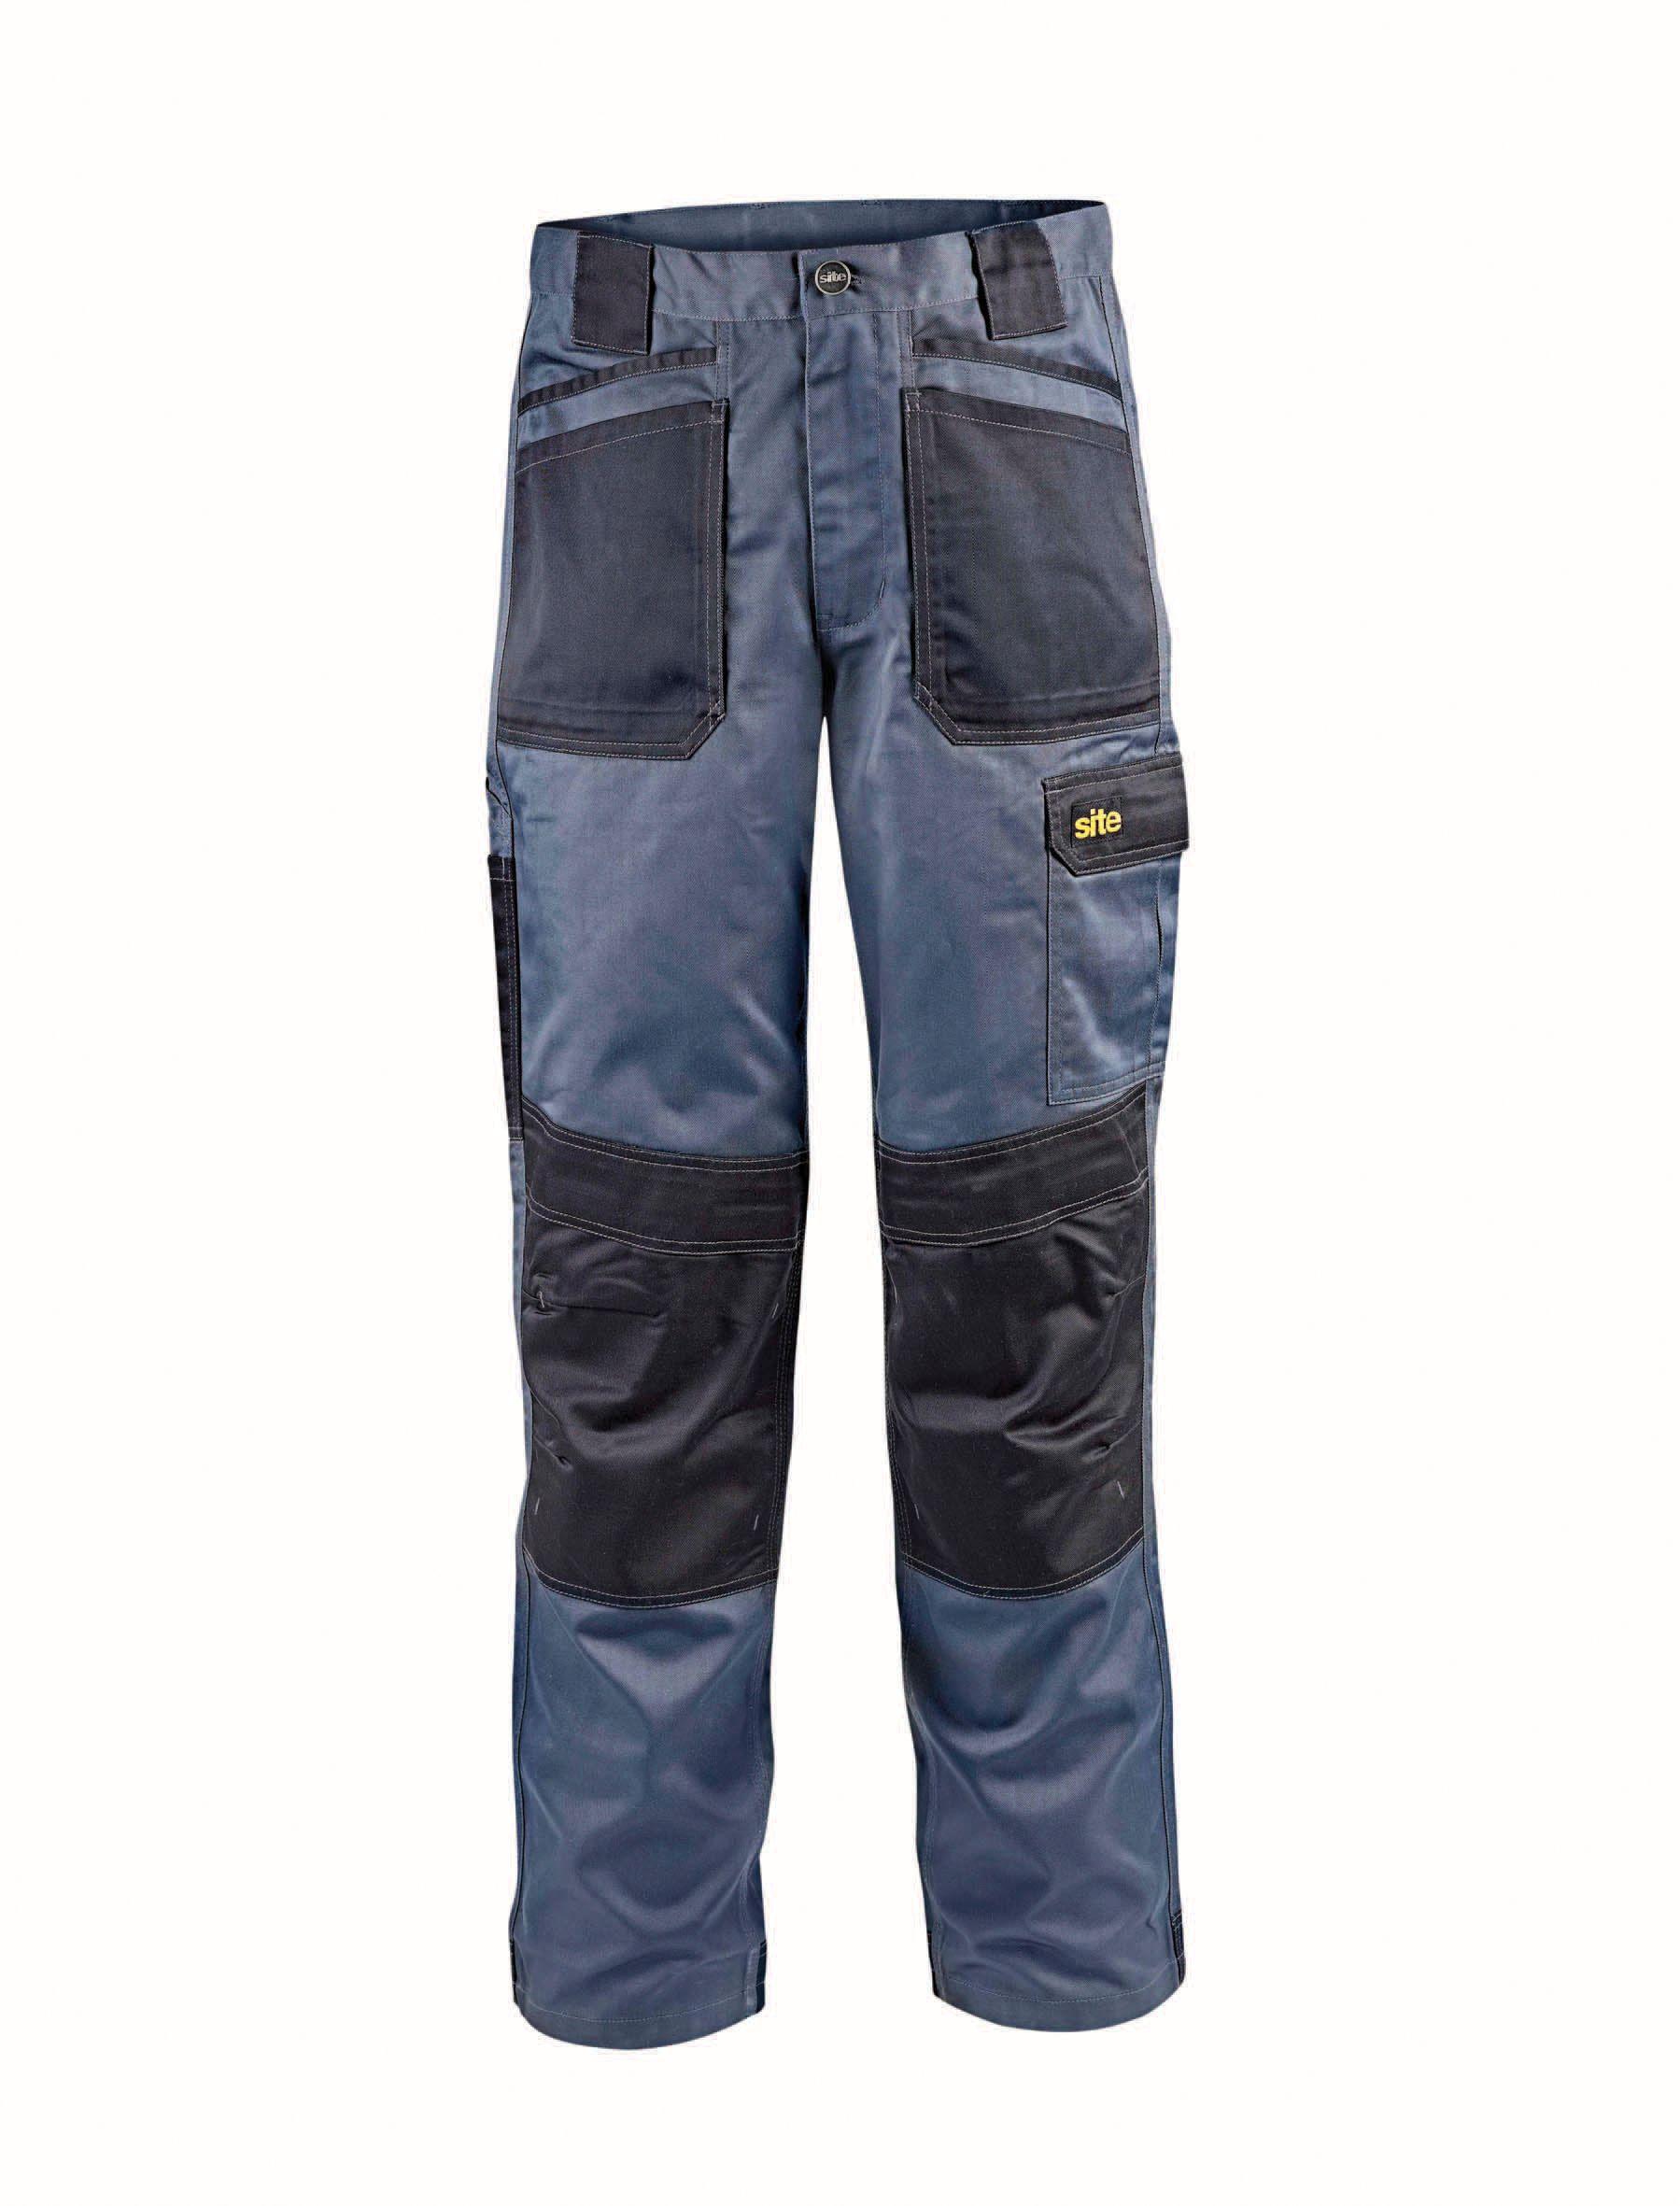 Site Grey Work Trousers W38 L32